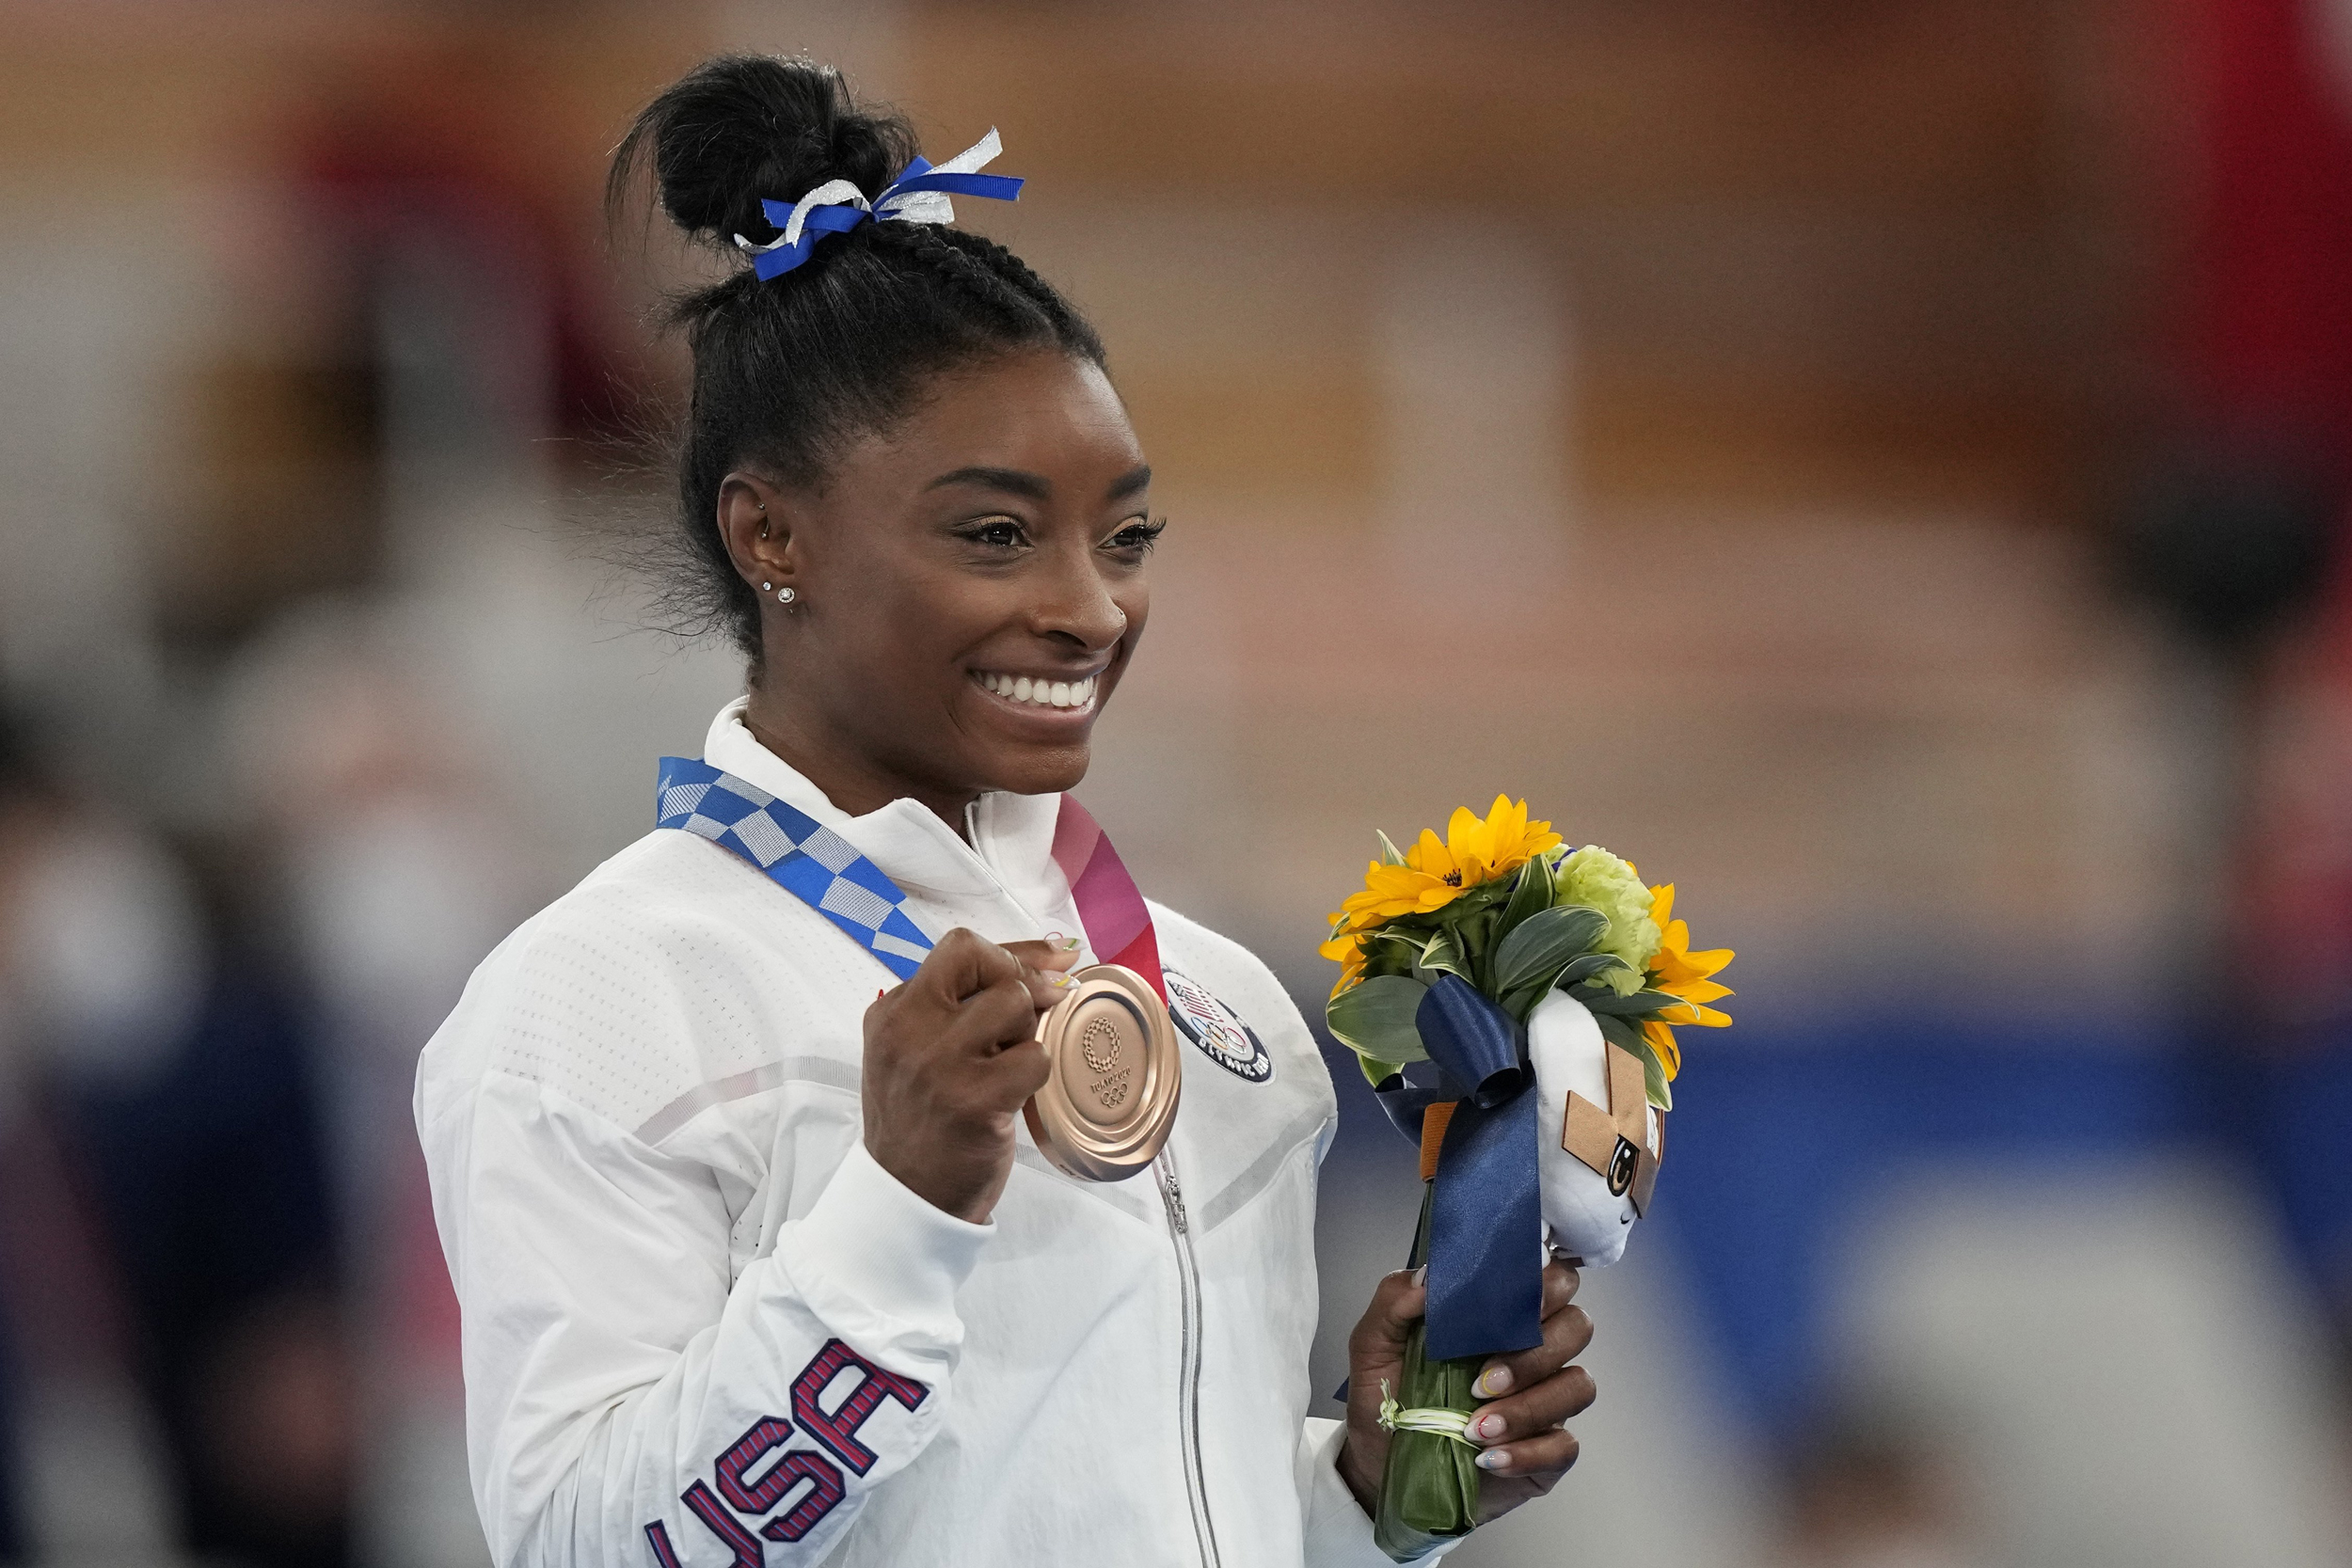 Simone Biles wins bronze on balance beam in Olympic return